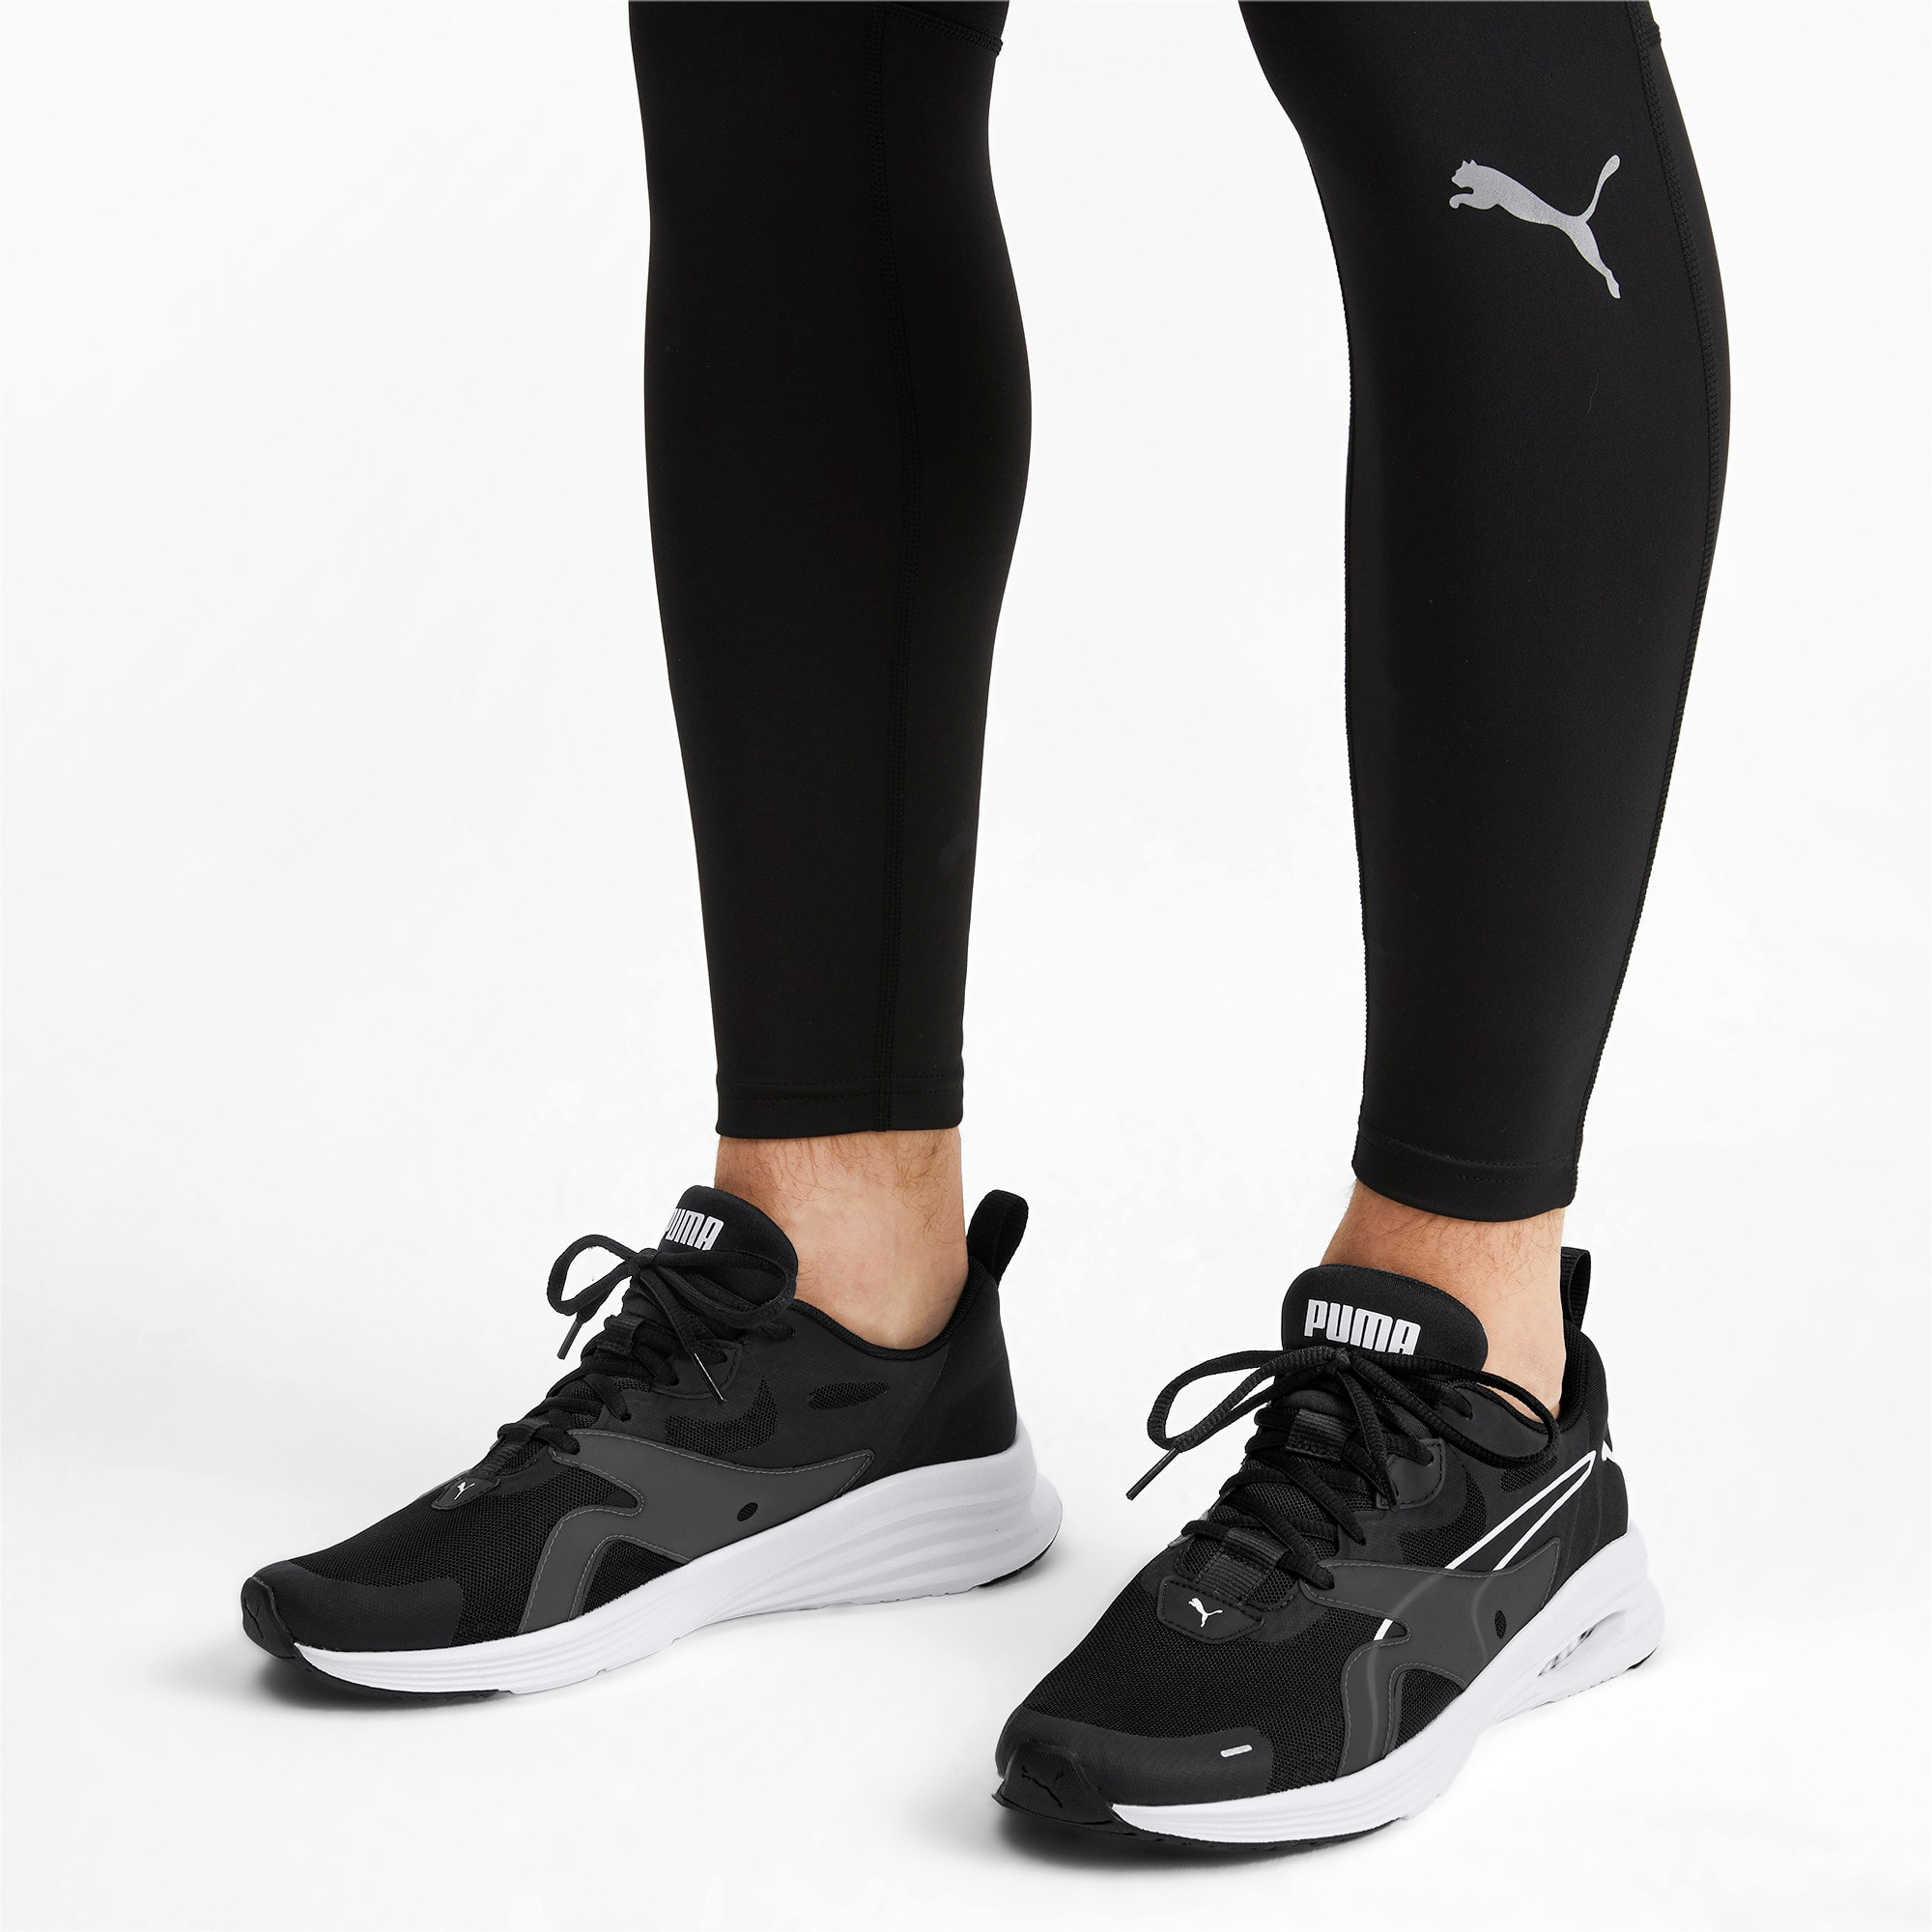 Thumbnail 2 of HYBRID Fuego Men's Running Shoes, Puma Black-Puma White, medium